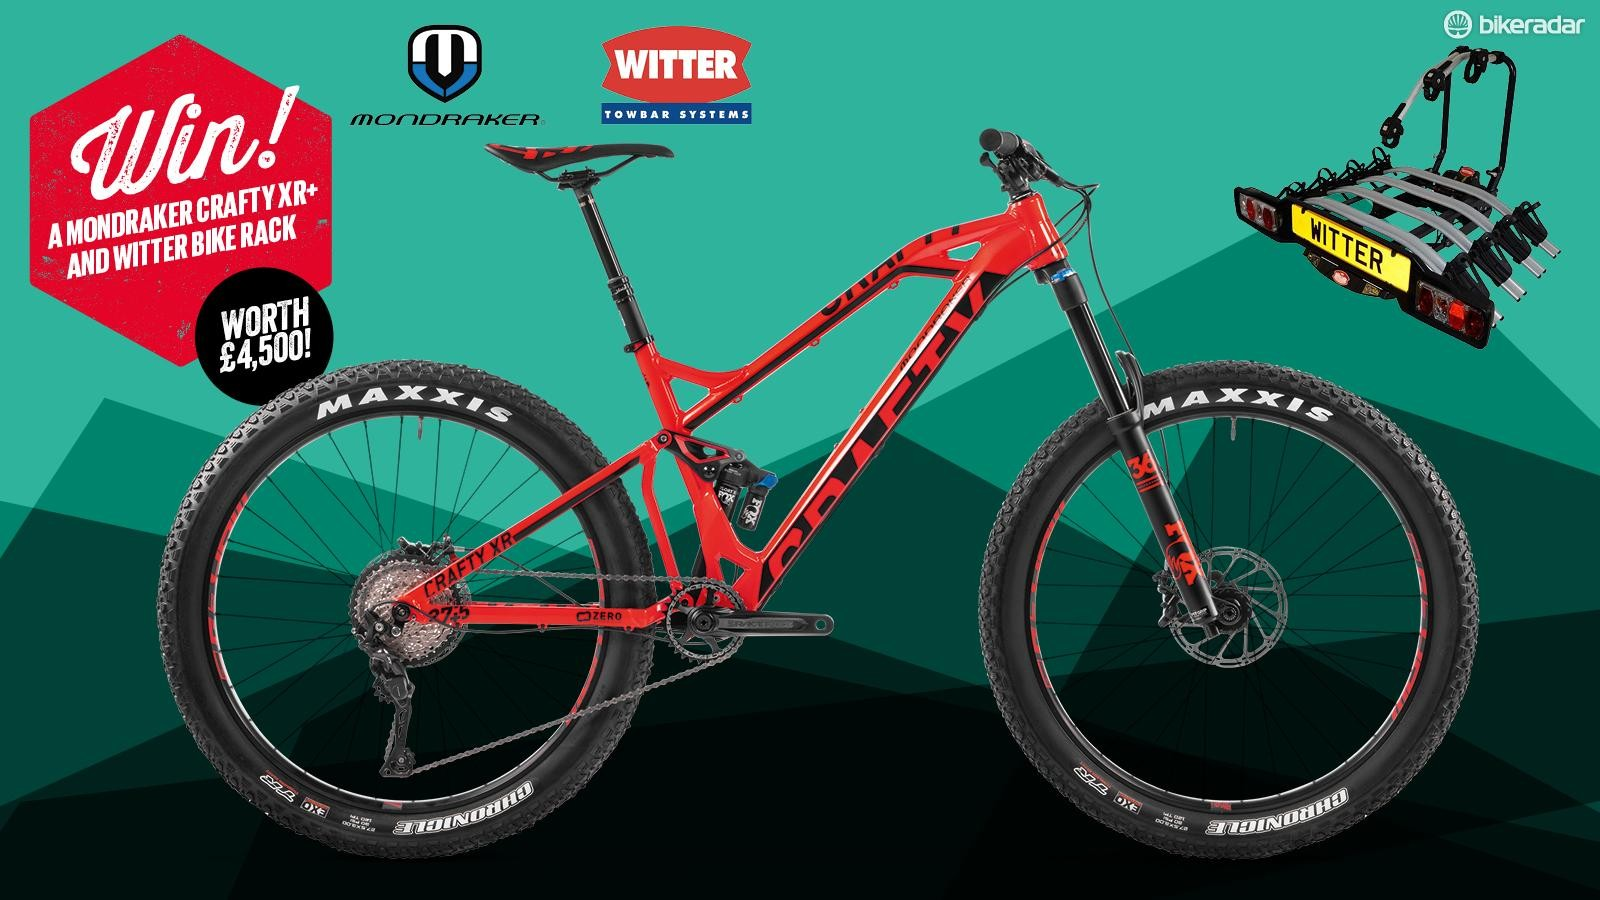 Win a Mondraker Crafty XR+ and Witter bike rack!